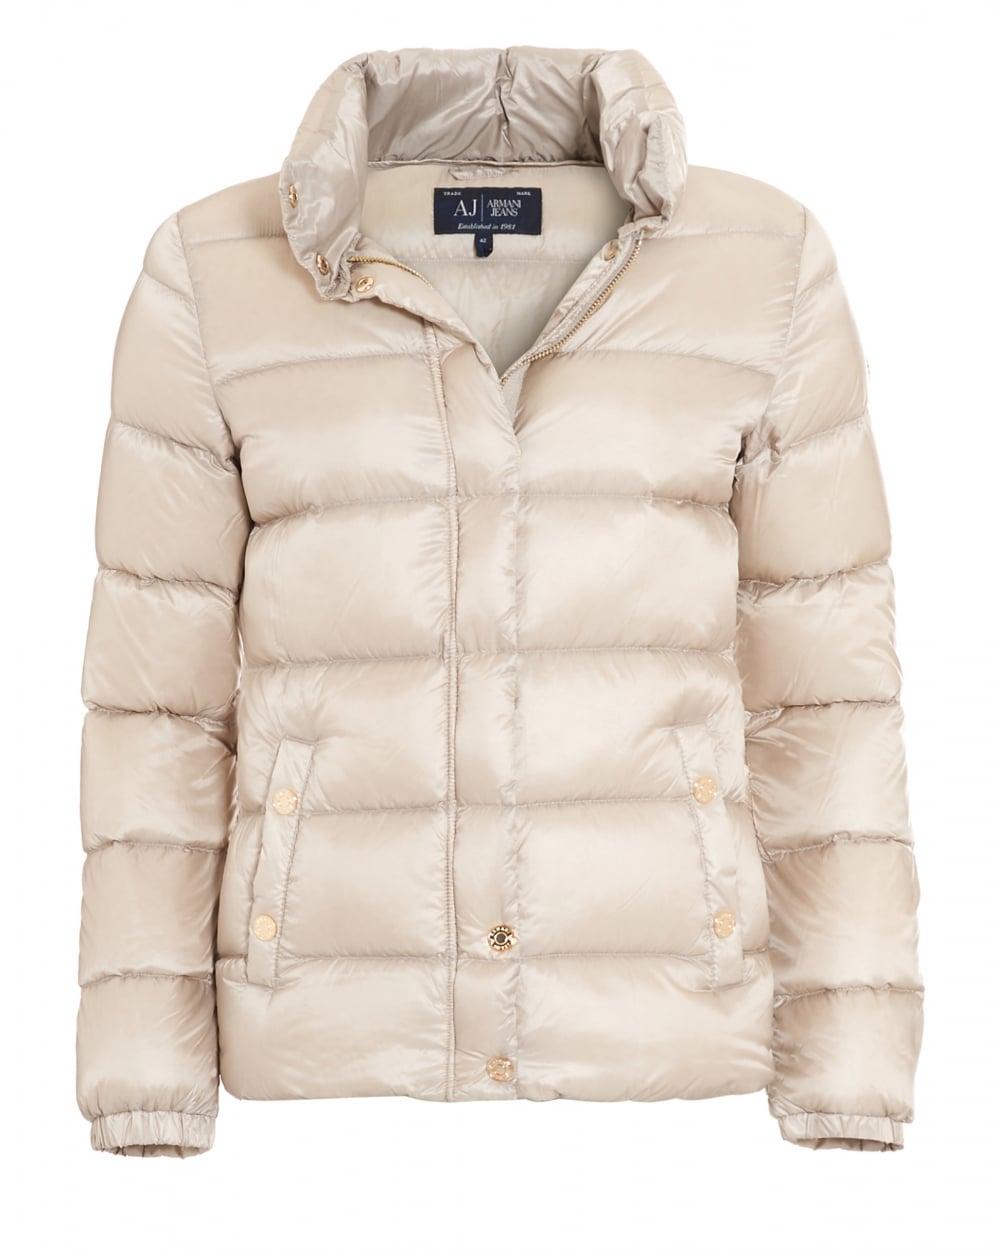 9d9714fe0 Armani Jeans Ladies Padded Coat